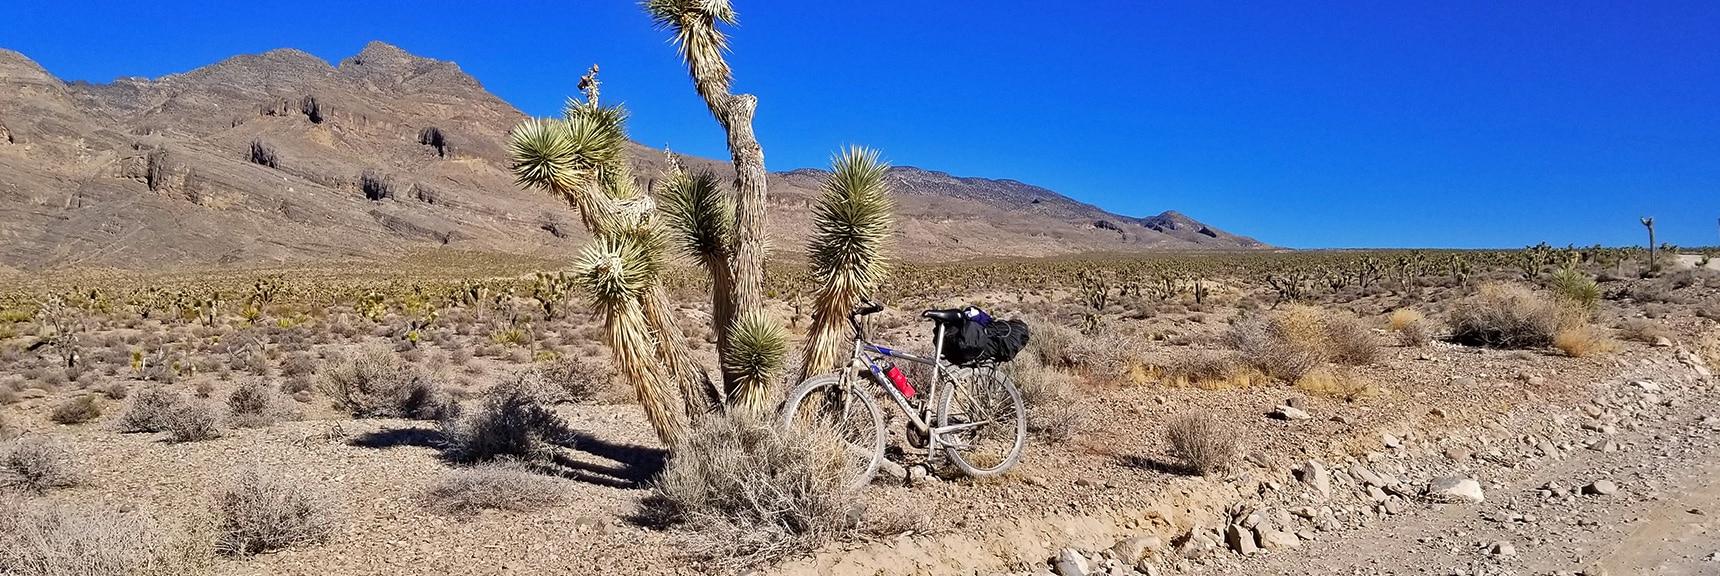 Mountain Bike Resting on Huge Joshua Tree in Yucca Forest   Lower Mormon Well Road   Sheep Range, Desert National Wildlife Refuge, Nevada